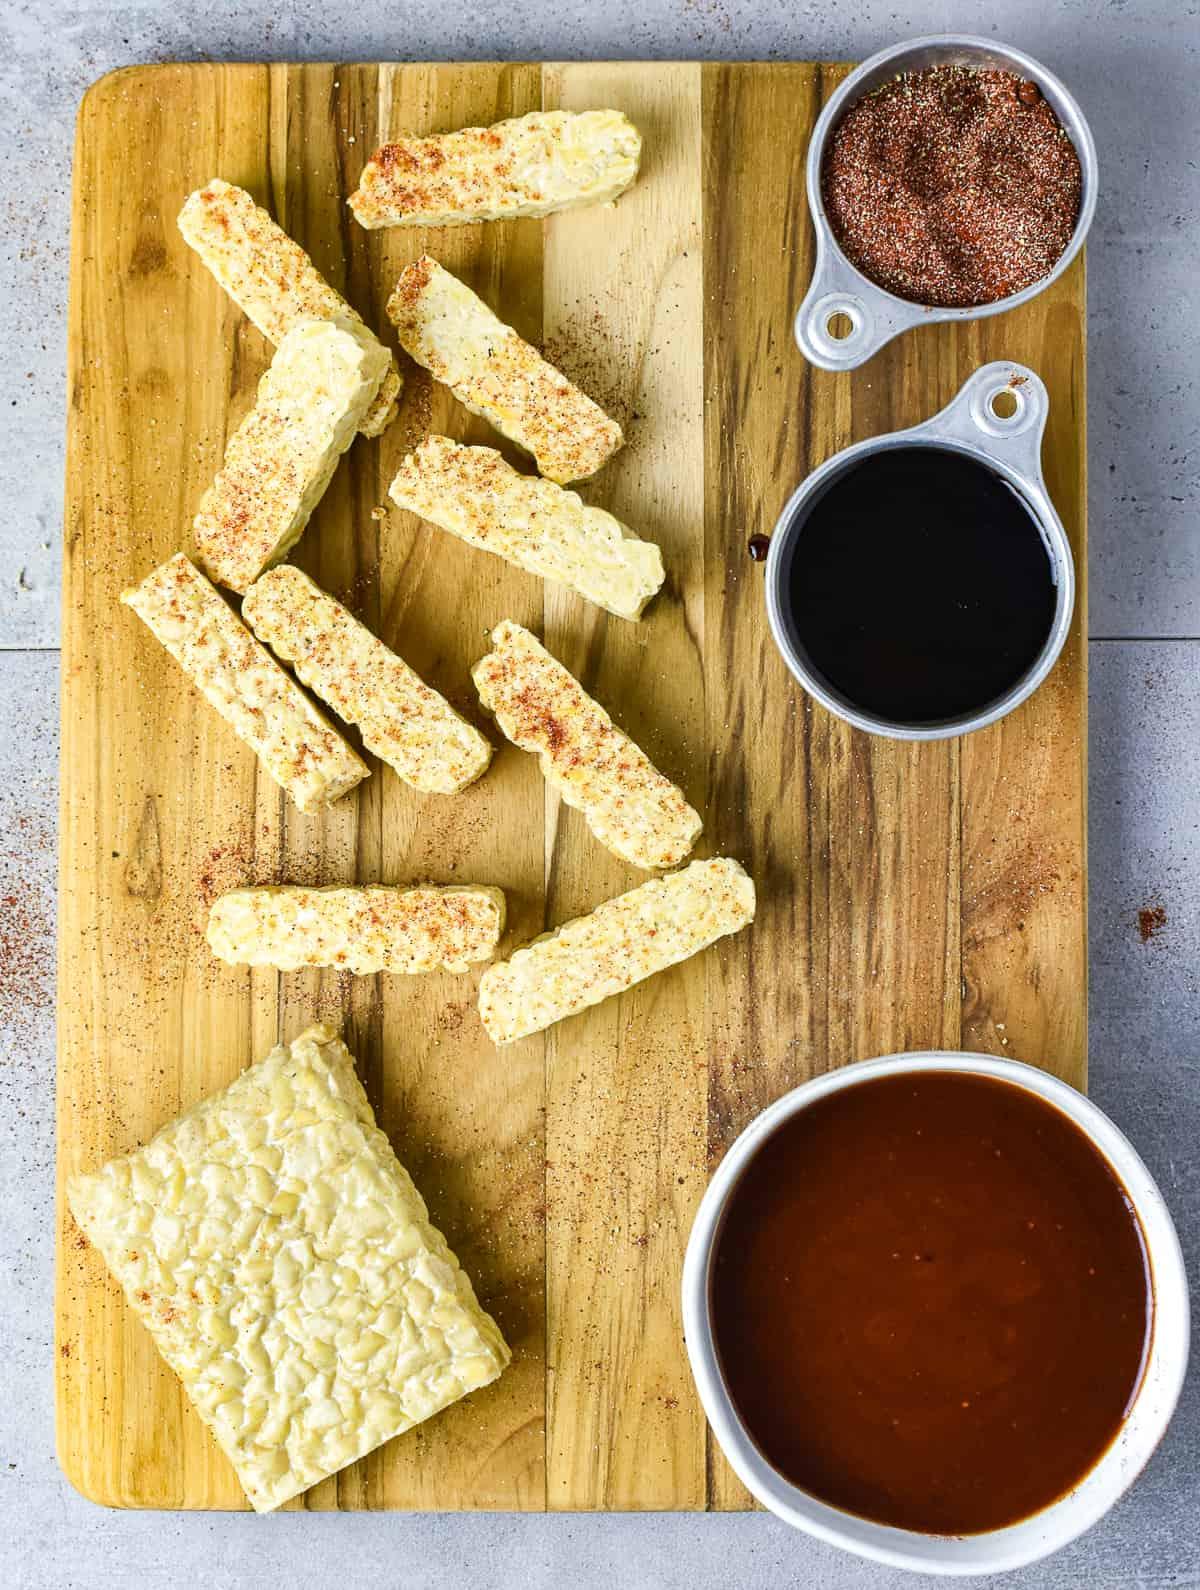 tempeh rib ingredients on cutting board.